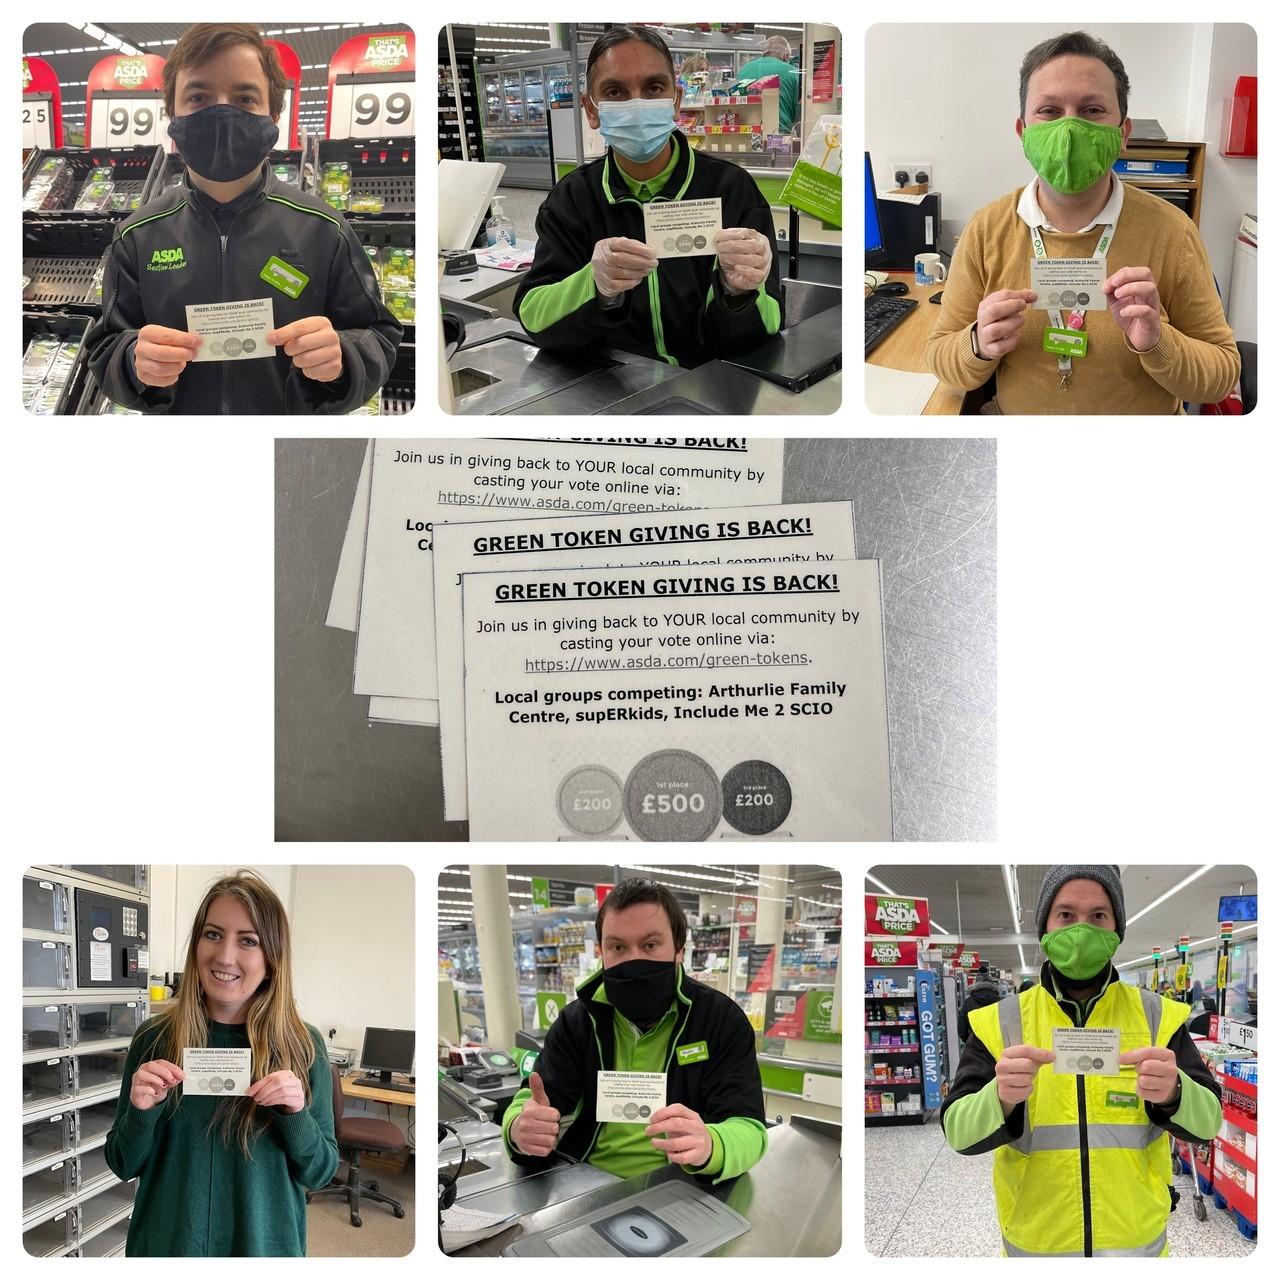 Green Token Giving is back! | Asda Newton Mearns